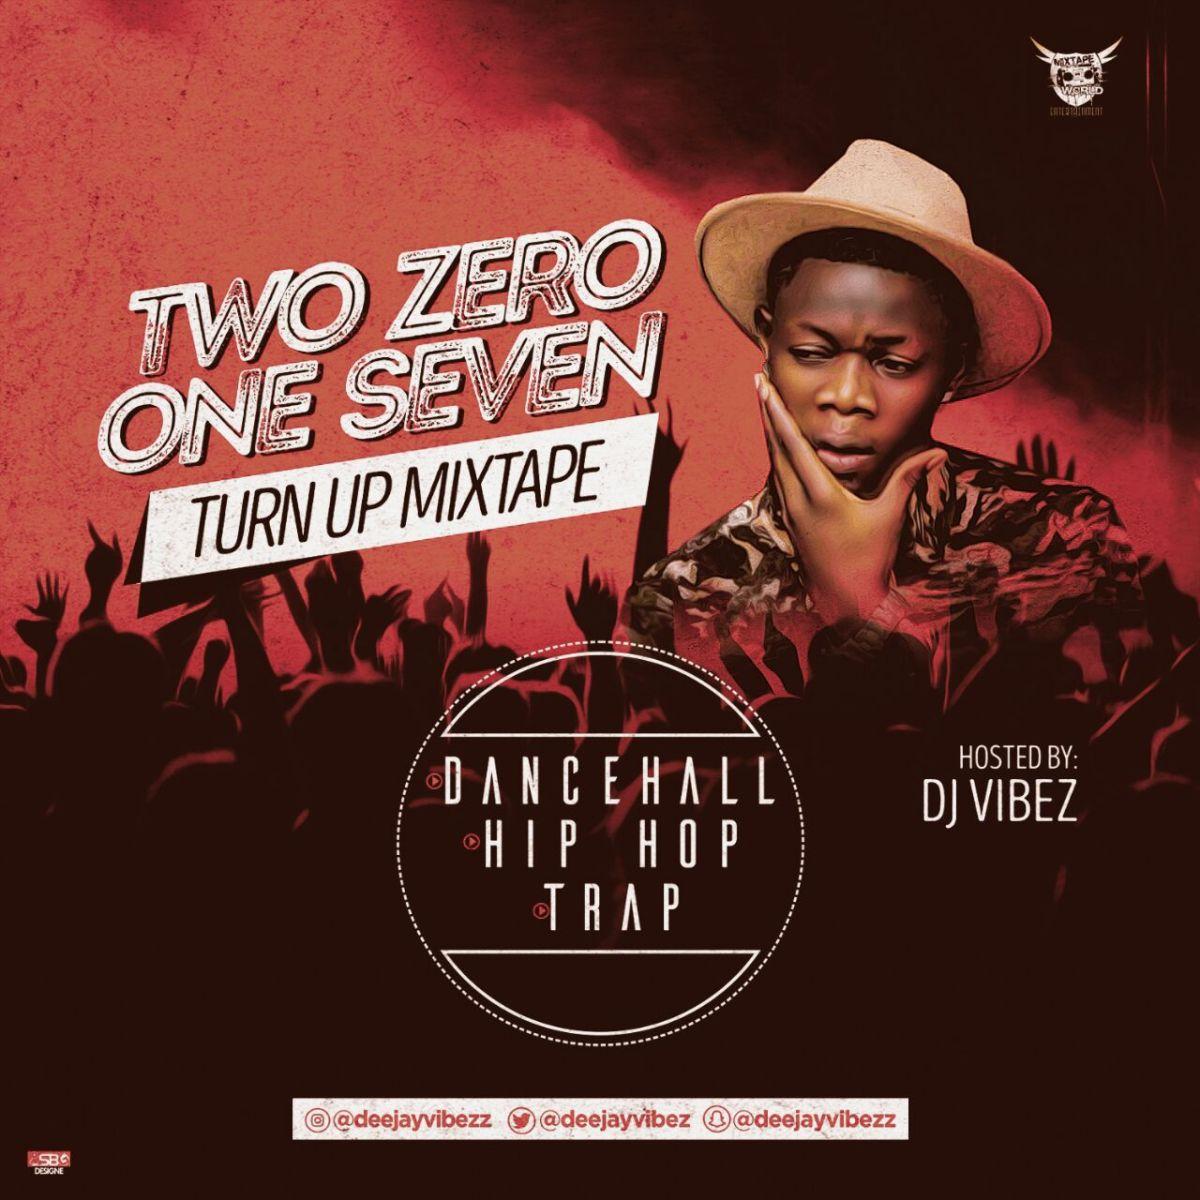 MIXTAPE: DJ Vibez - Two Zero One Seven (Turn Up Mixtape)